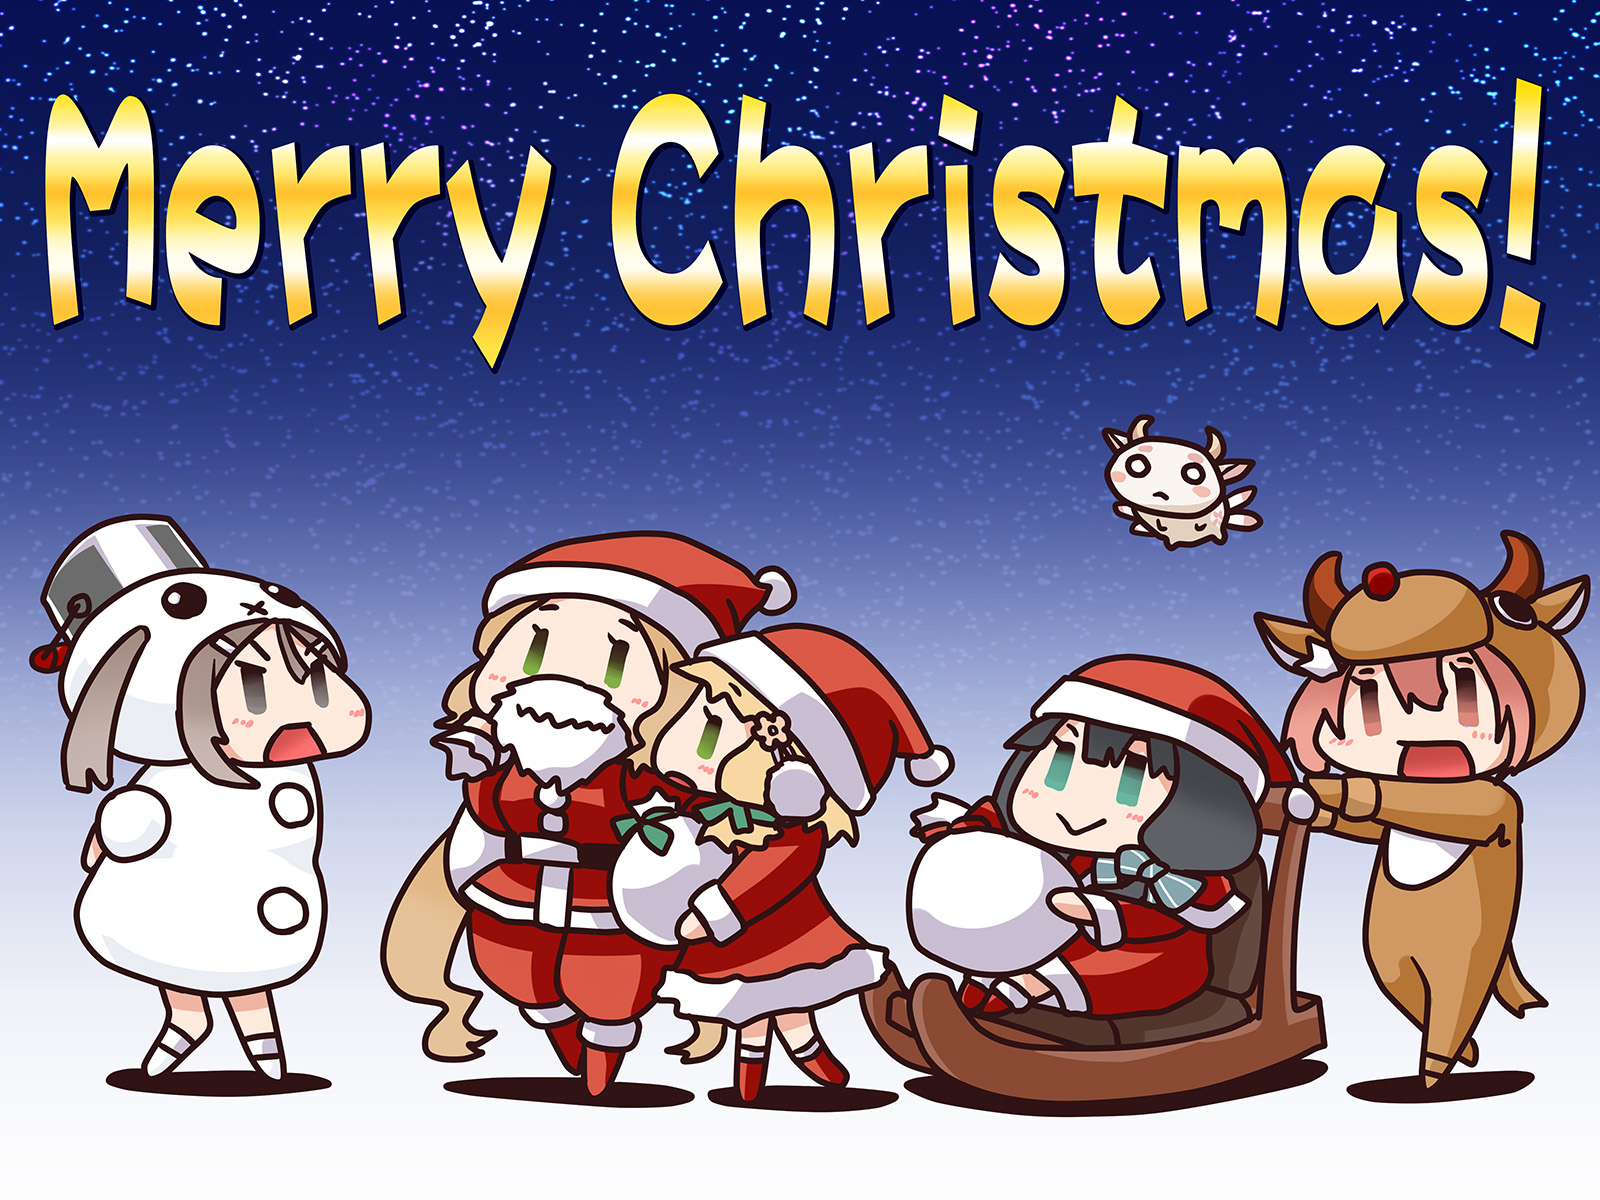 https://blog-imgs-72-origin.fc2.com/e/r/u/erutasocont/u299n426_2_Christmas2.jpg